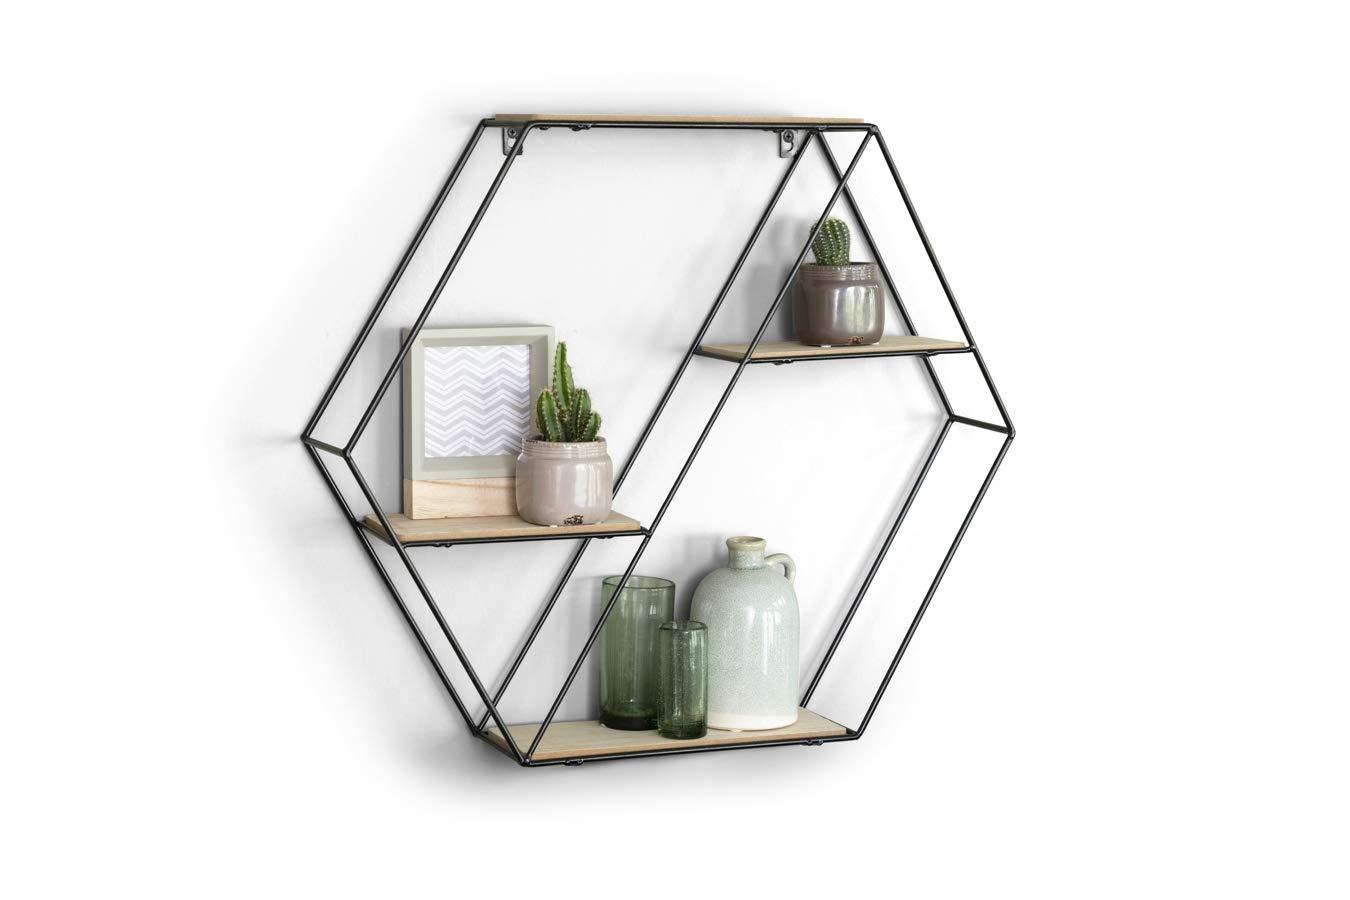 Lifa Living Hexagon Vintage Wandregal Aus Holz Und Metall Schwarz